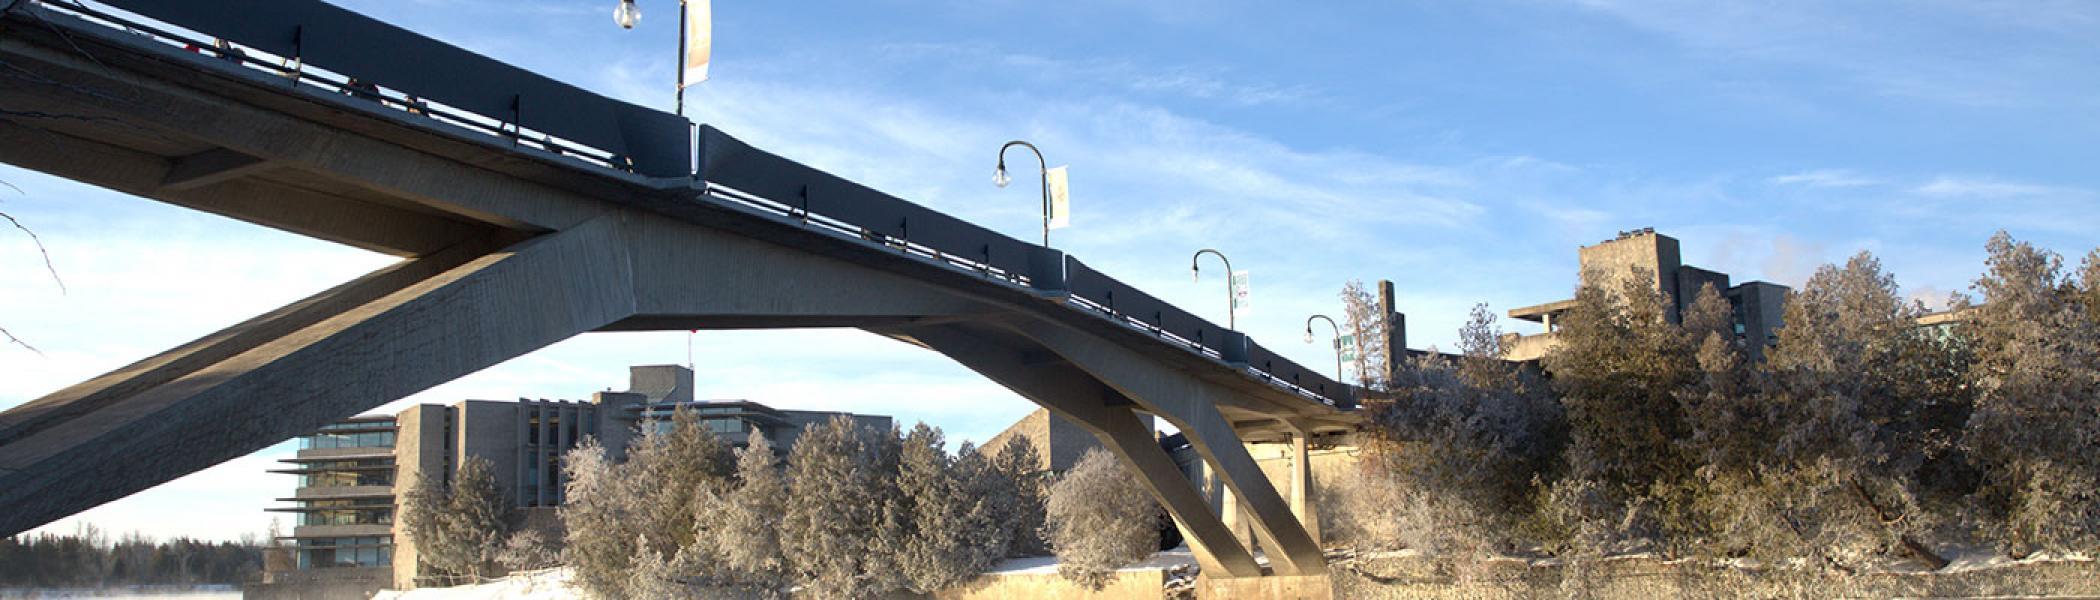 View of Faryon Bridge from beneath